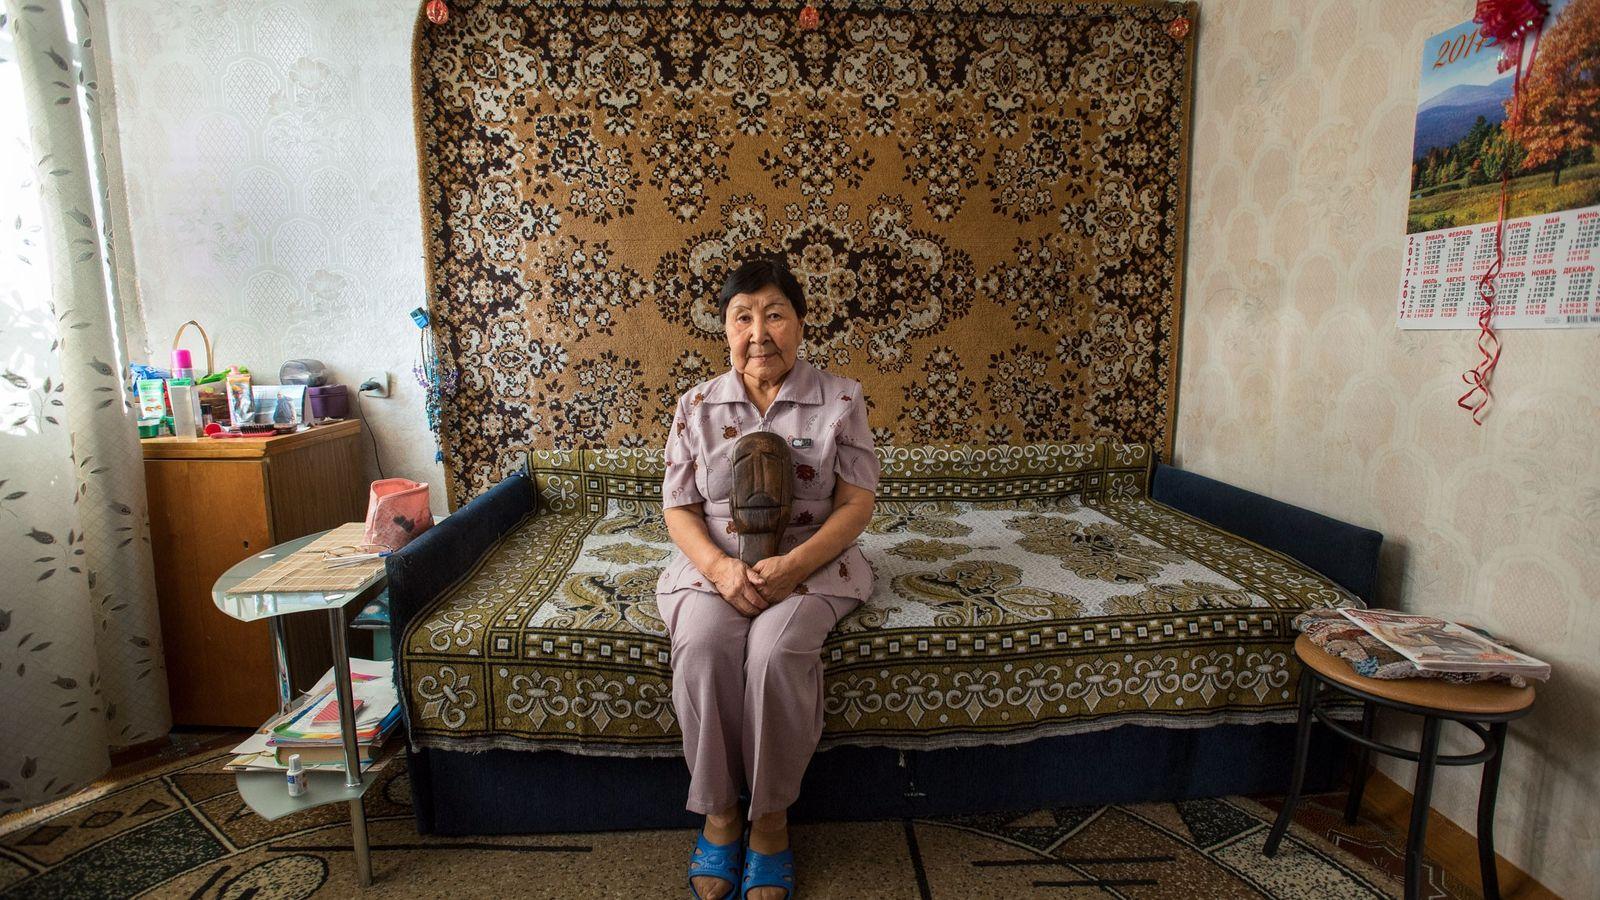 Elizaveta Dobrieva sentada no seu apartamento em Lavrentiya, Chukotka.